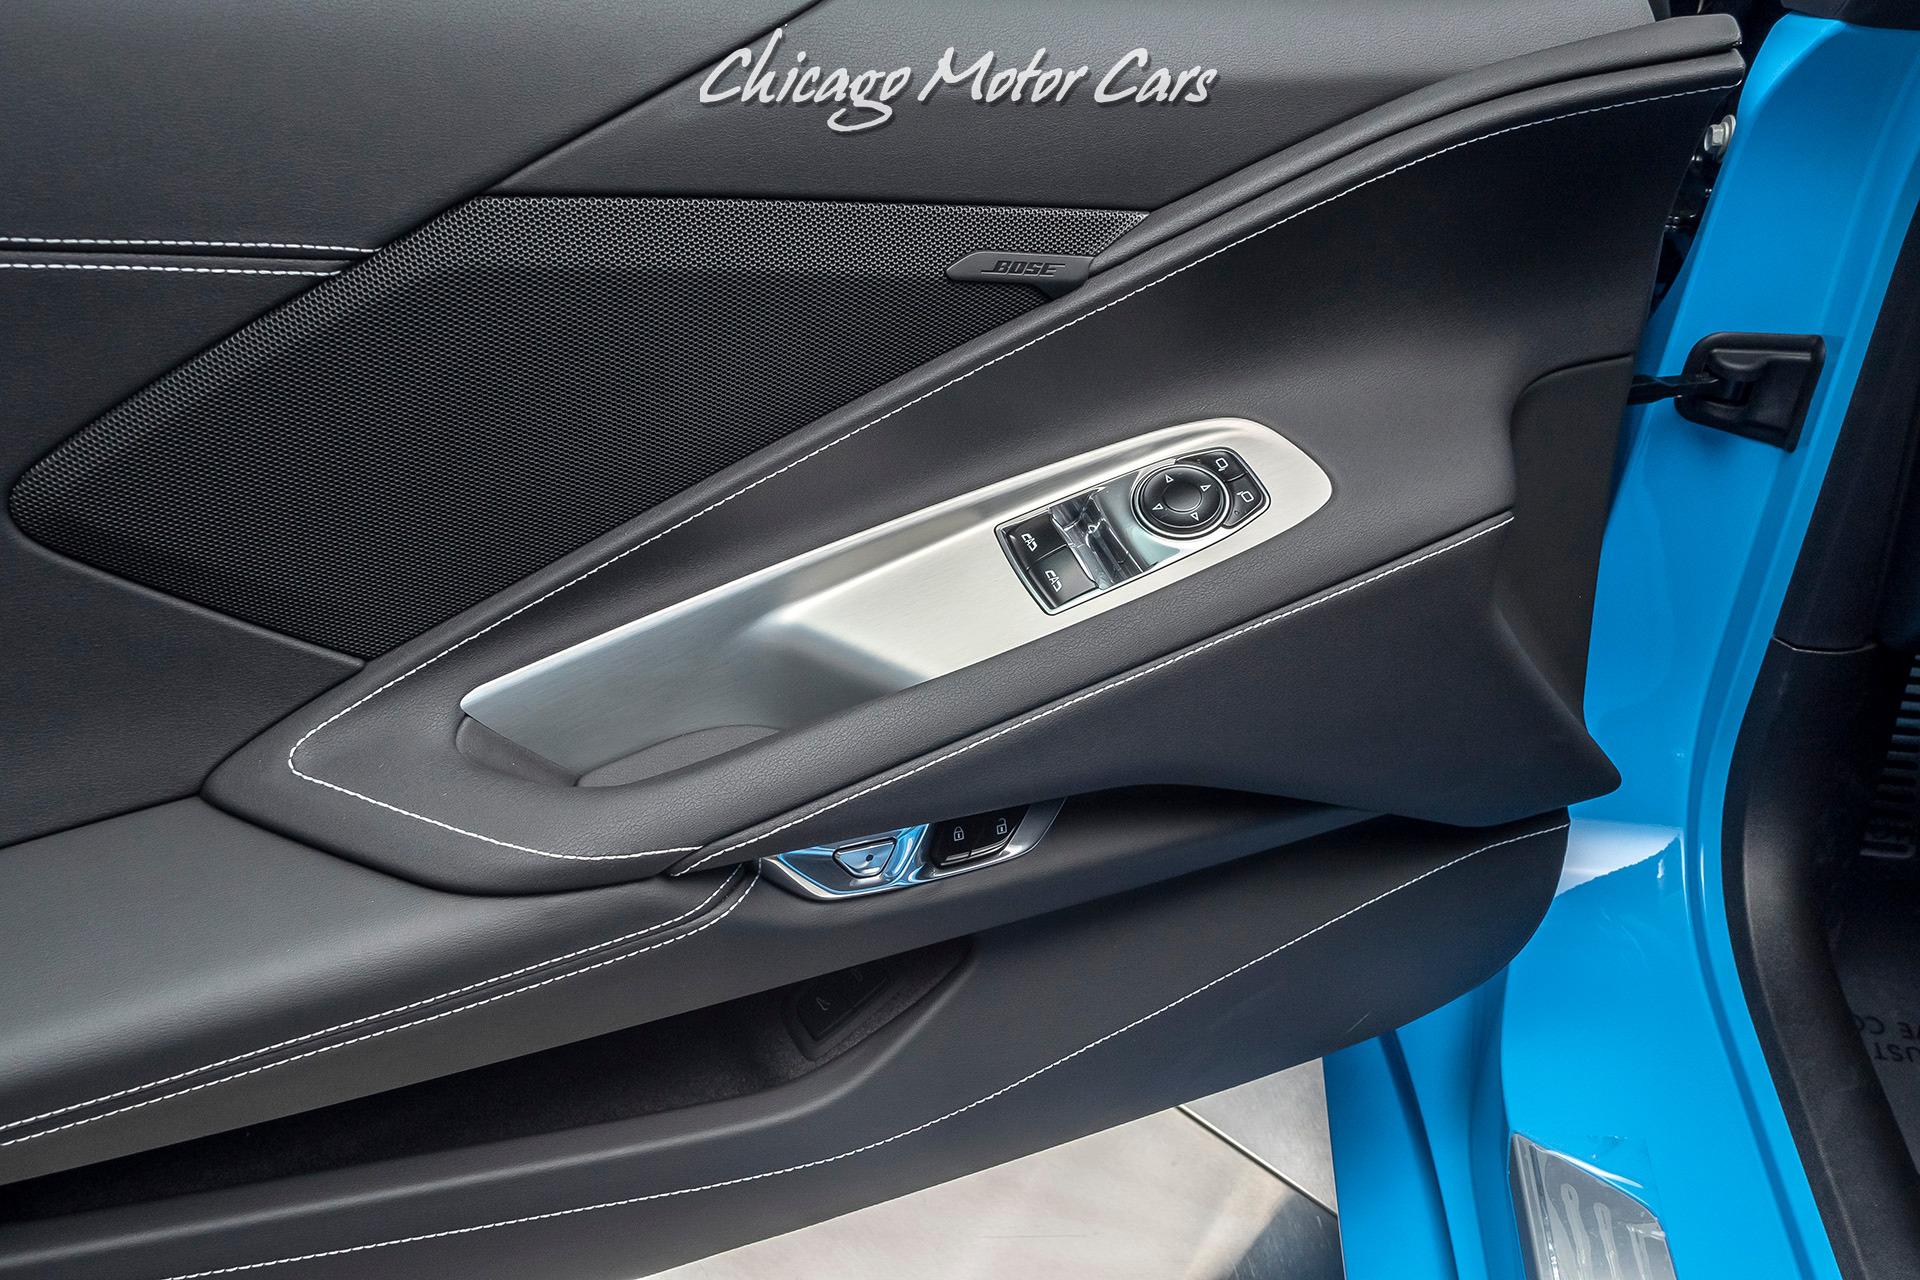 Used-2020-Chevrolet-Corvette-Stingray-RARE-Rapid-Blue-LOW-Miles-Performance-Exhaust